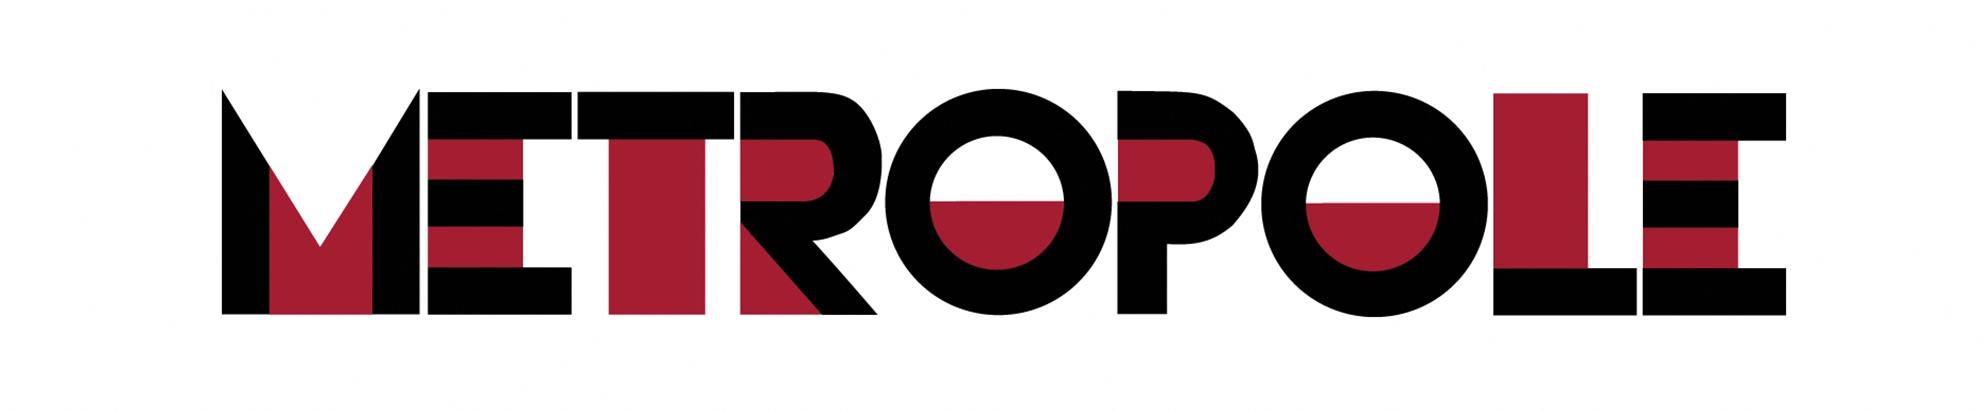 MetropoleLogo.jpg